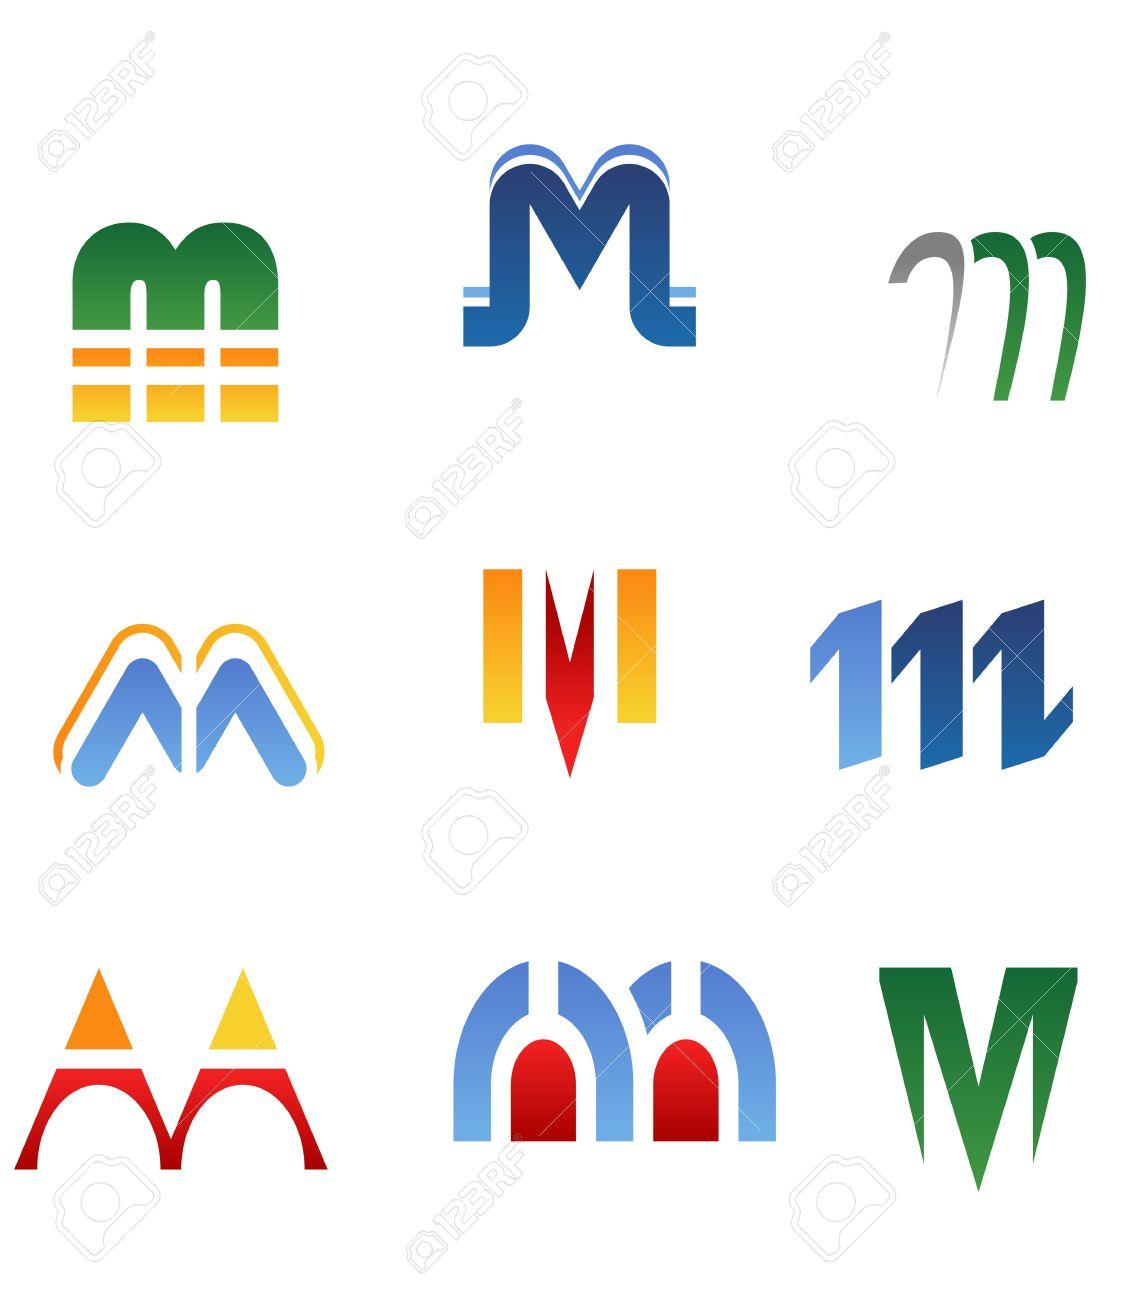 Free alphabet logo clipart svg stock Set Of Alphabet Symbols And Elements Of Letter M Royalty Free ... svg stock